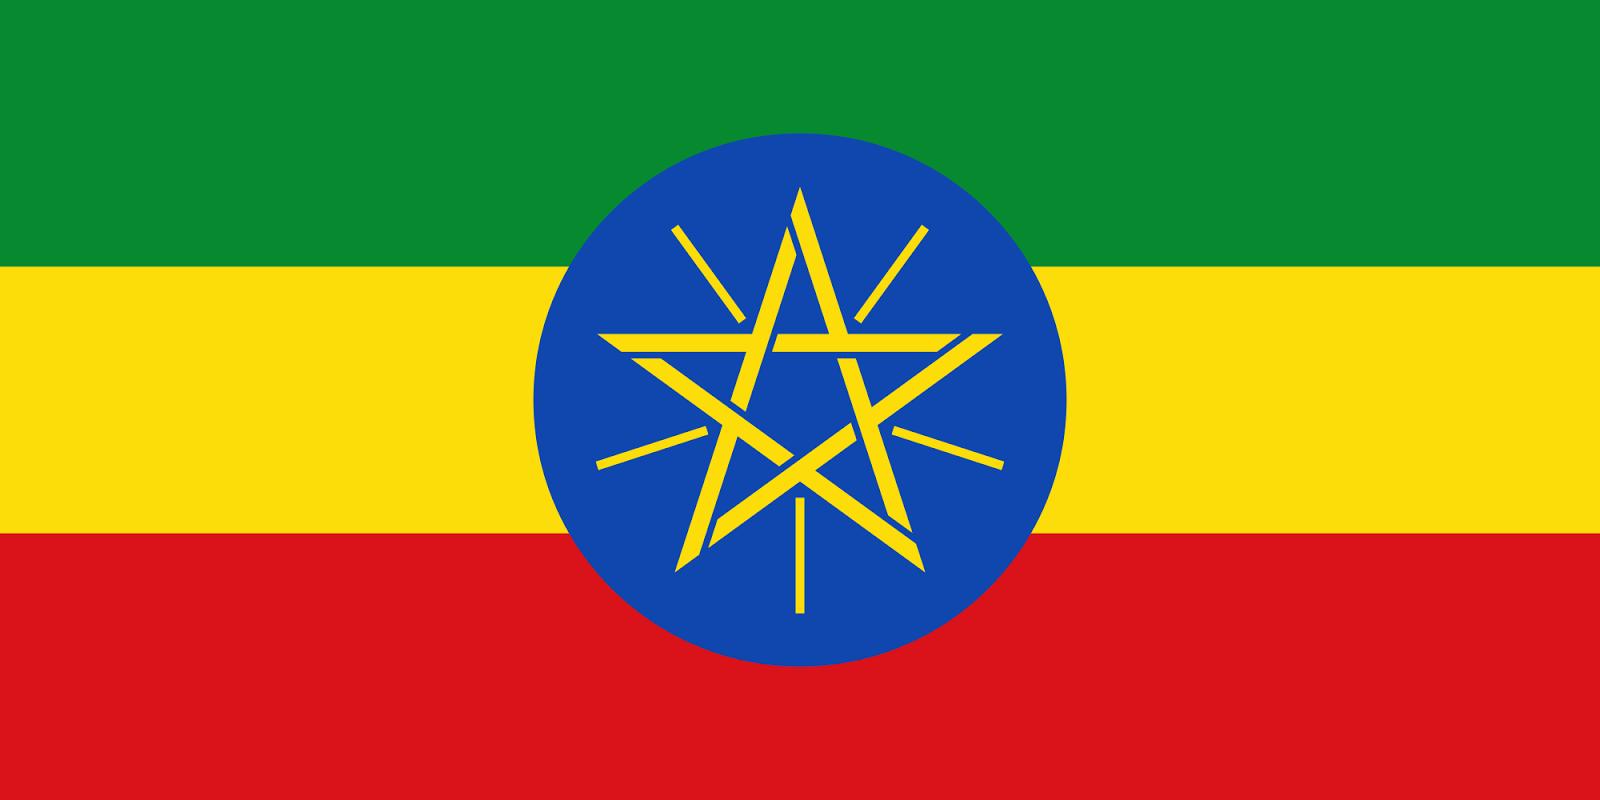 http://carbrandsincurrentproduction.blogspot.com.es/search/label/Ethiopia